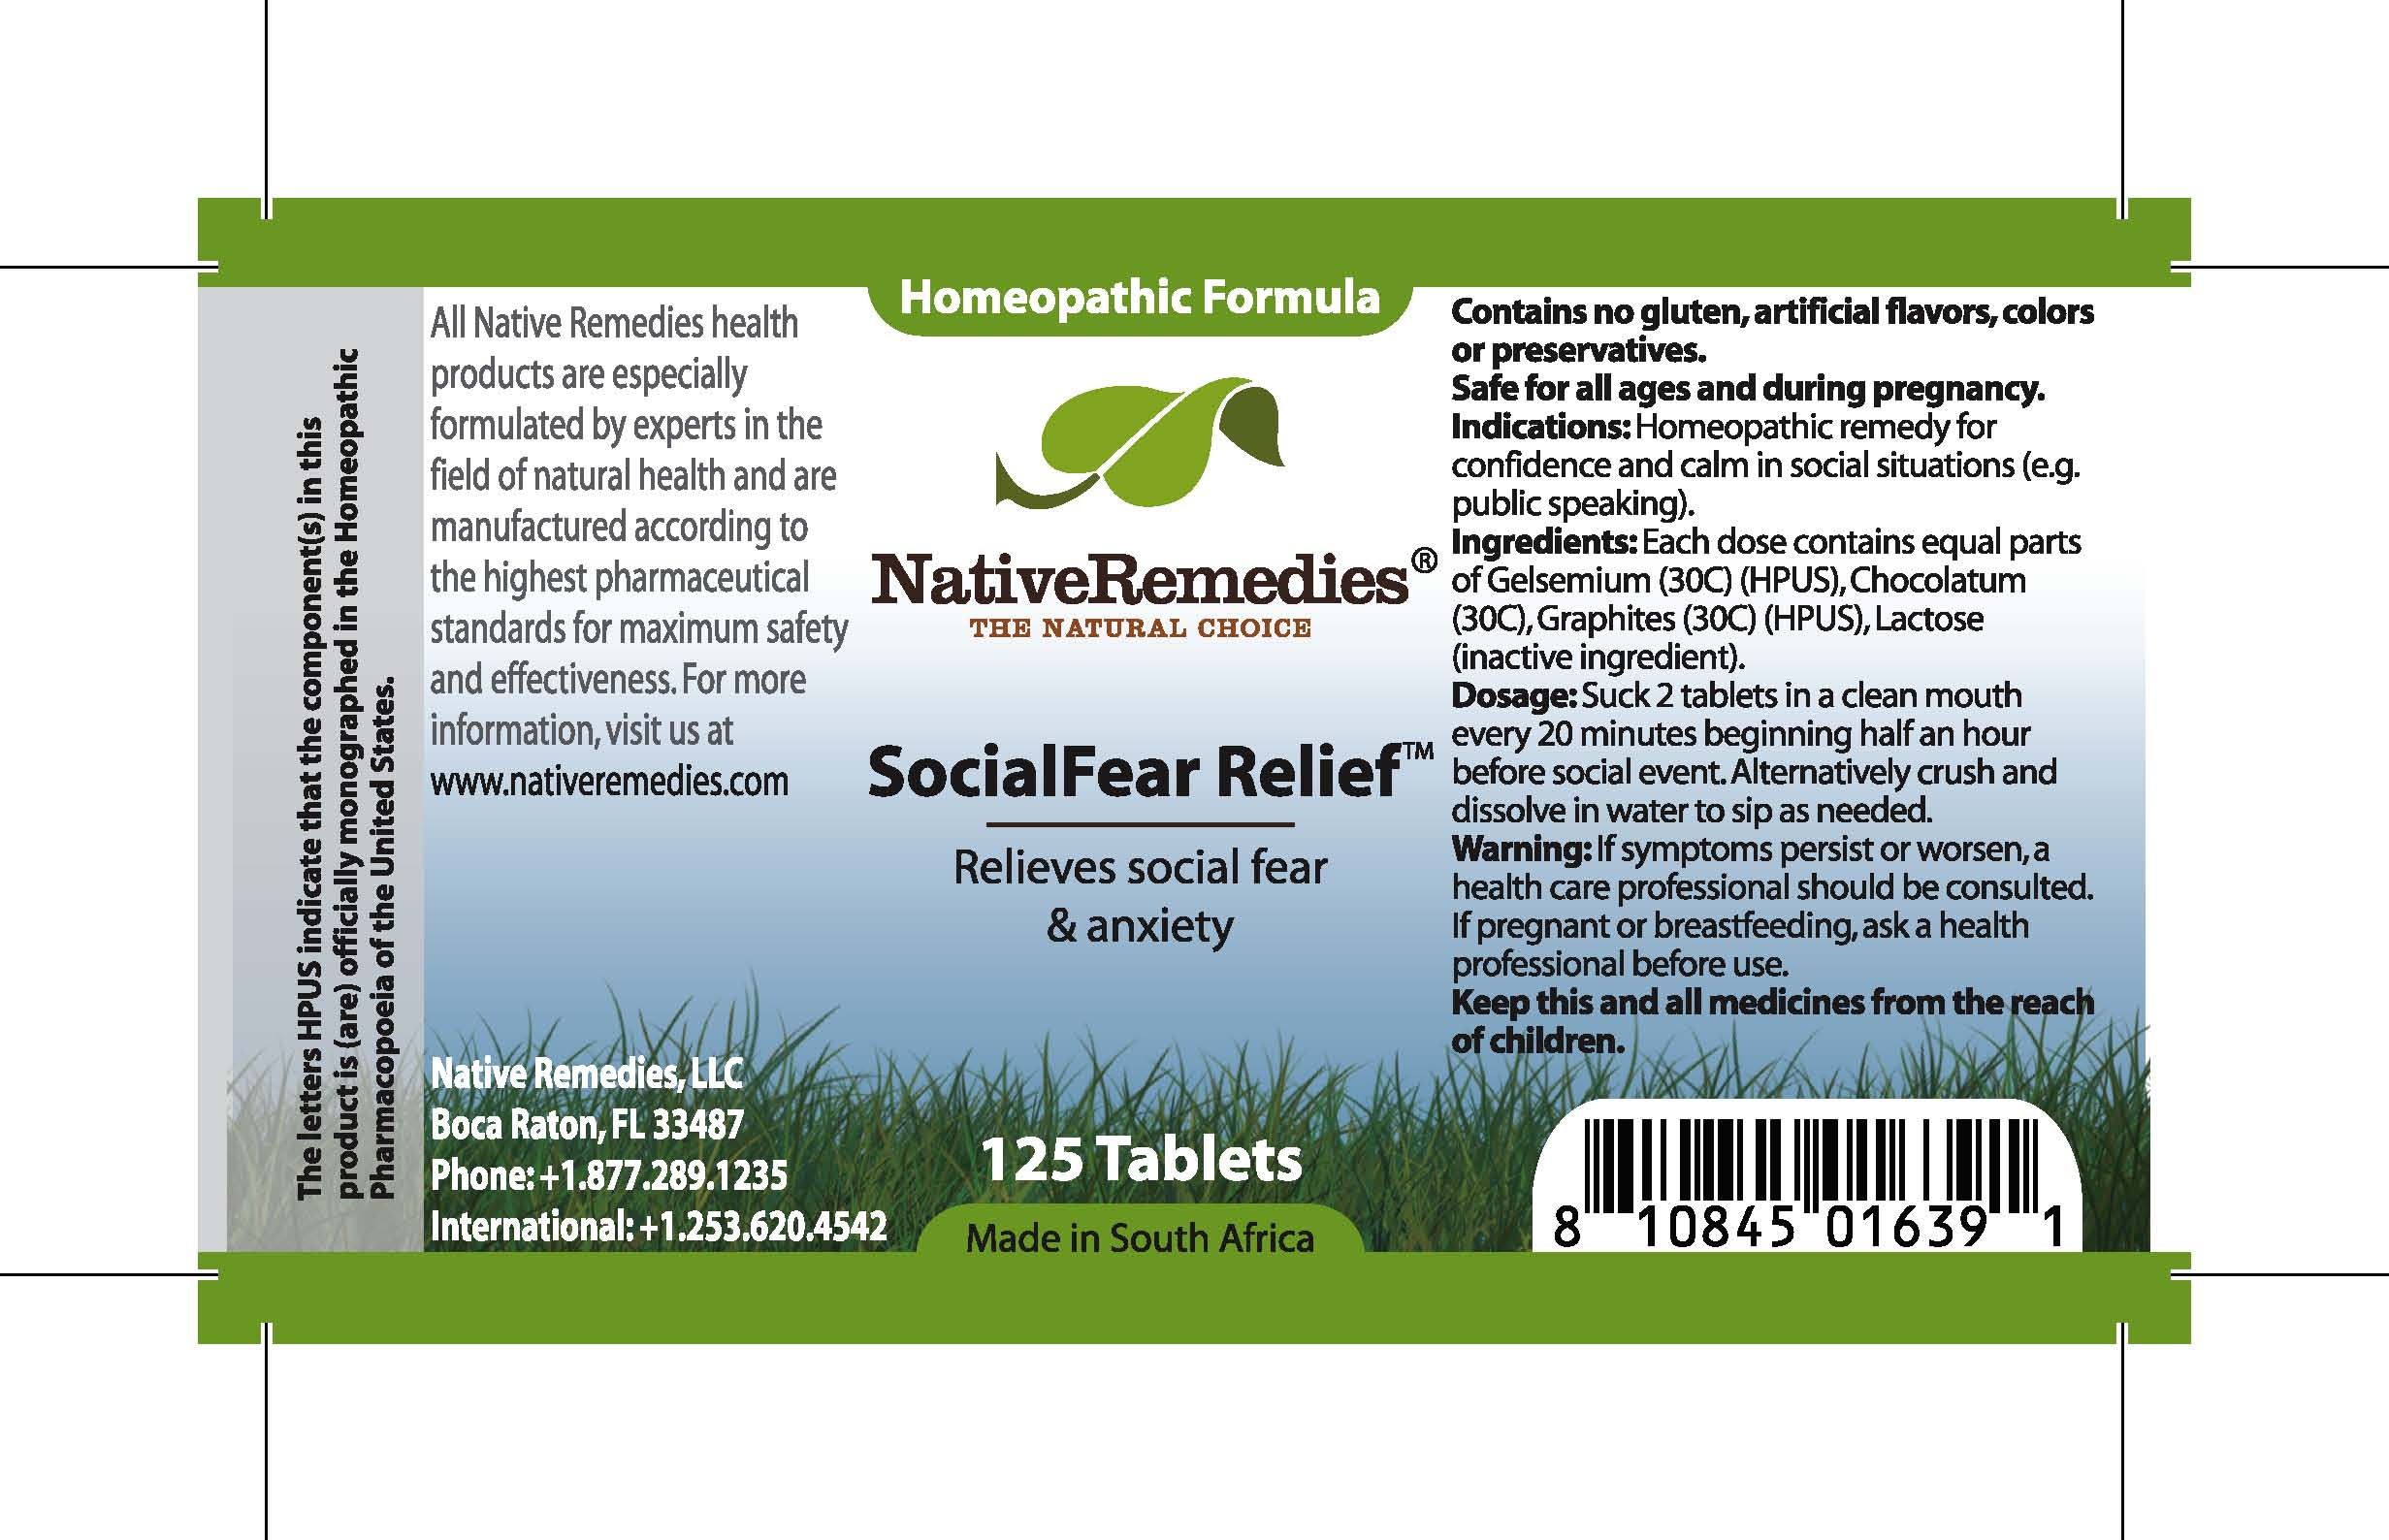 Socialfear Relief (Gelsemium, Chocolatum, Graphites) Tablet [Feelgood Health]